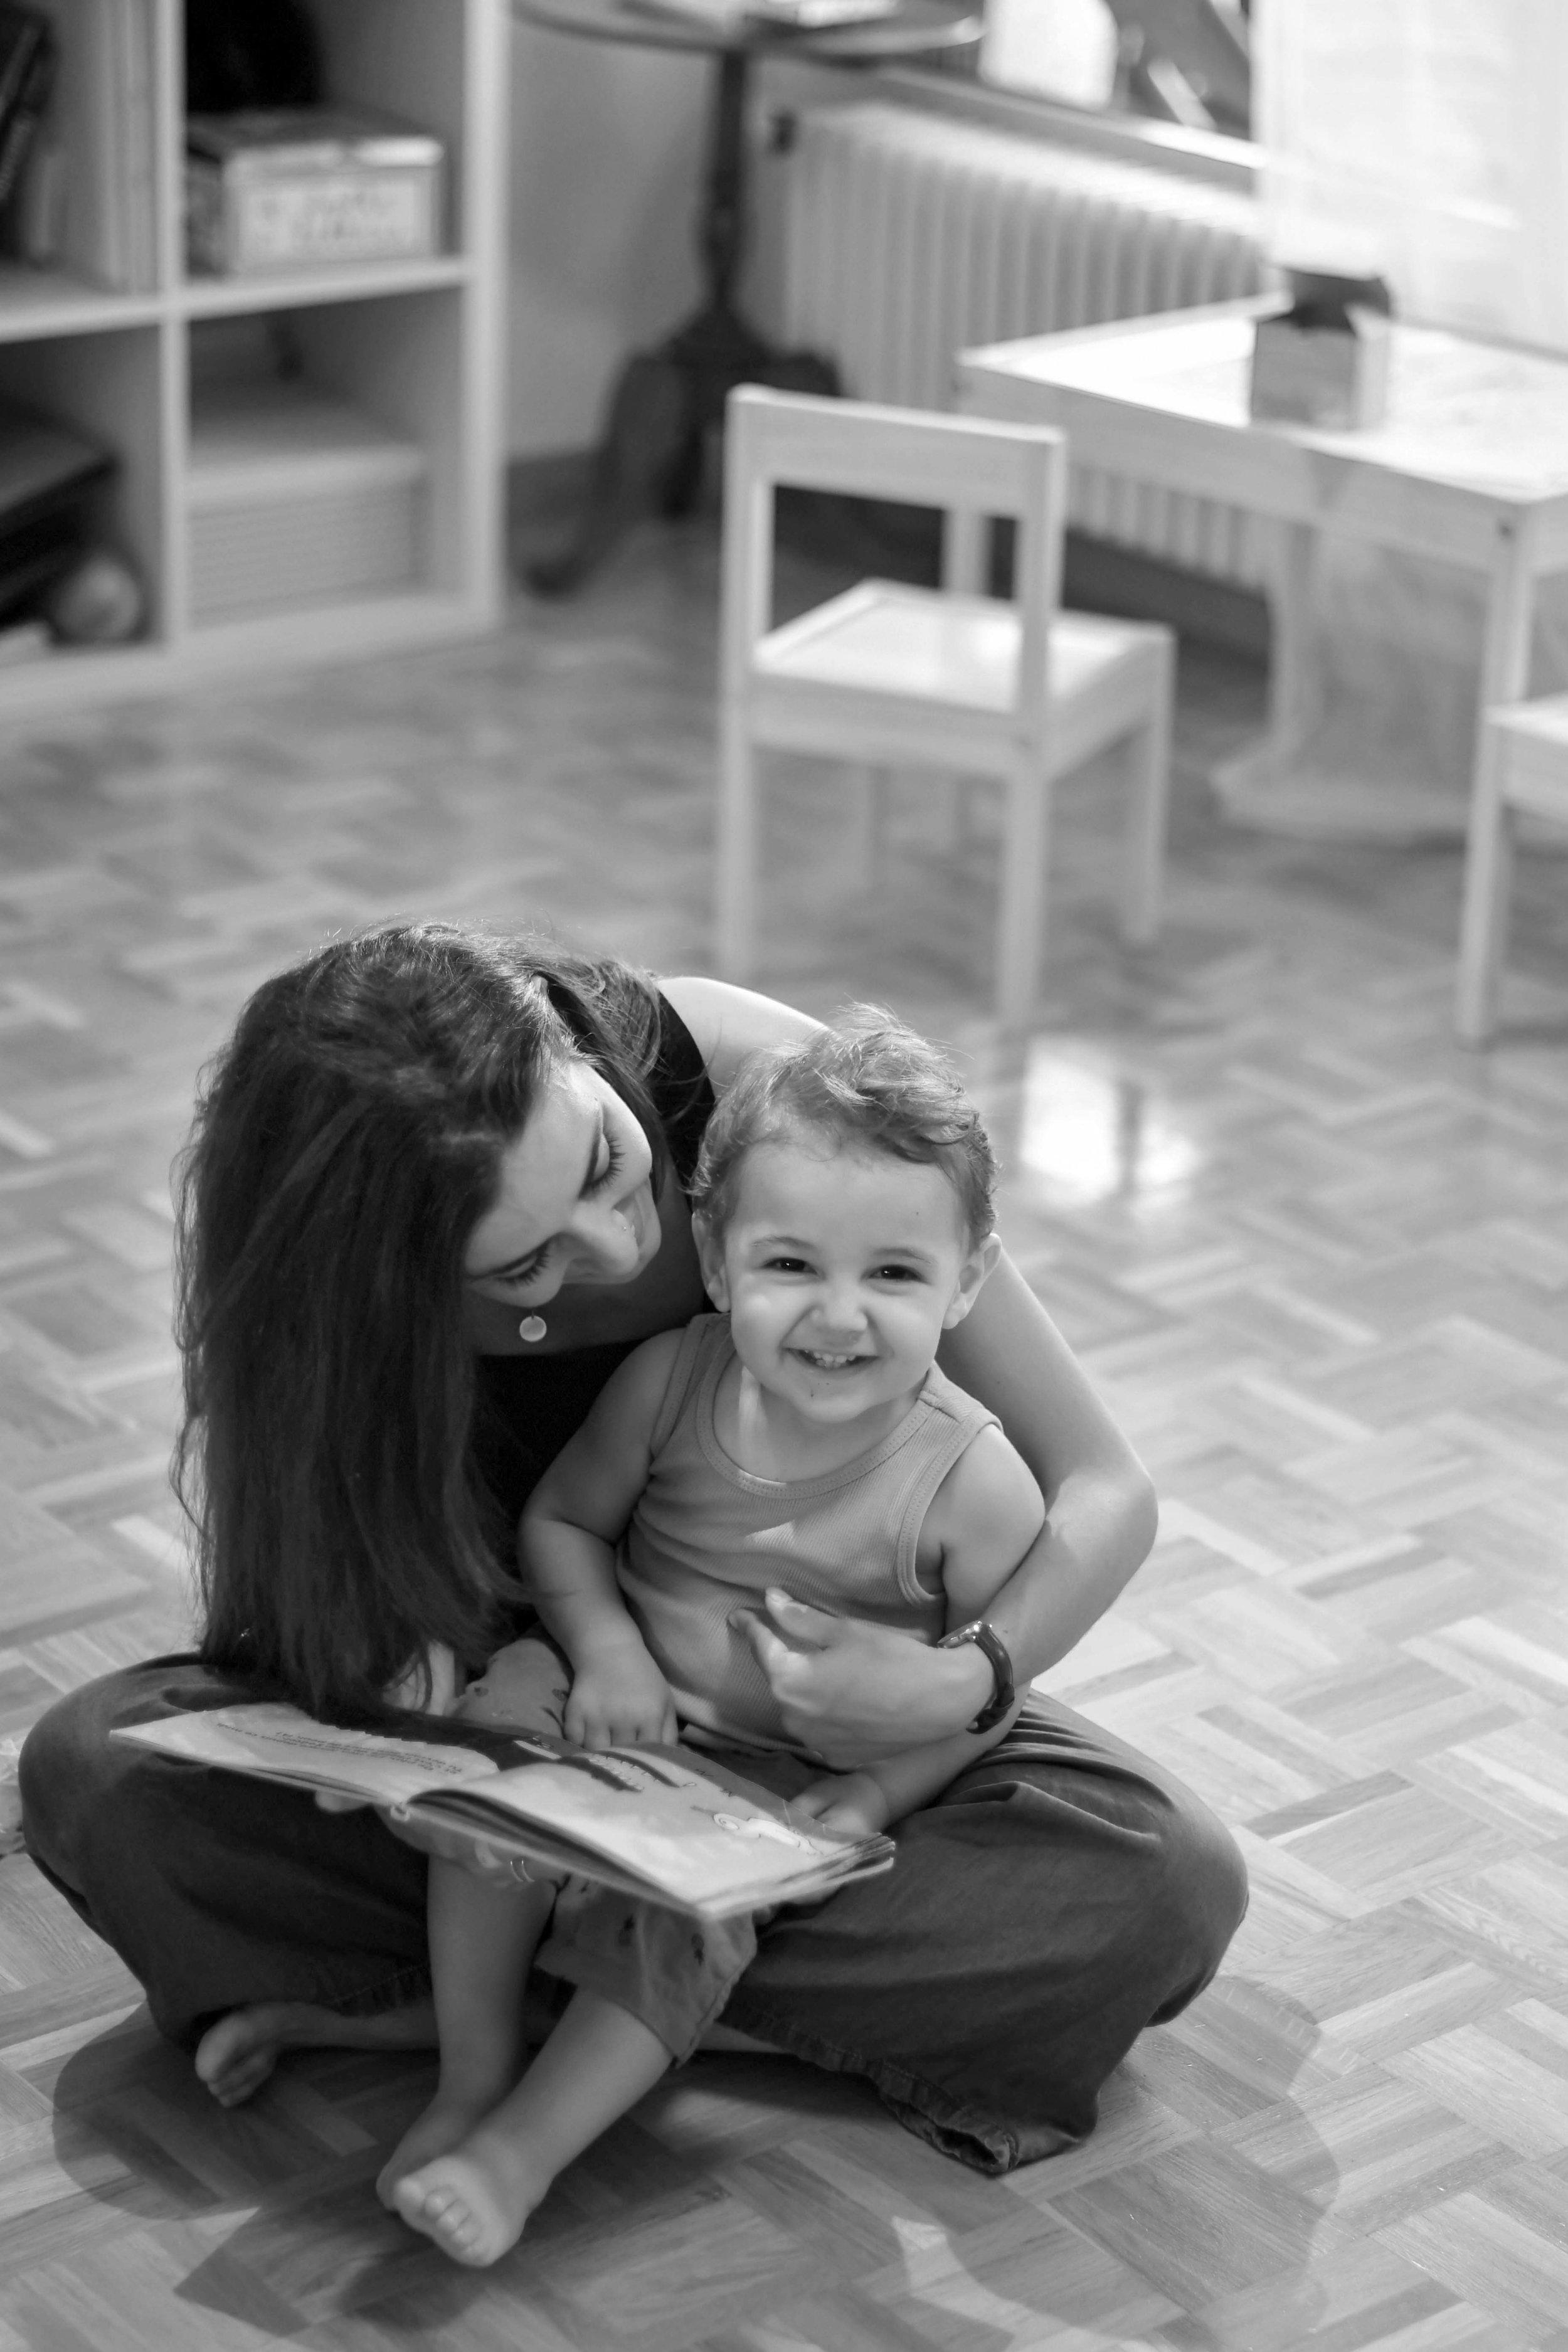 MotherStories_Rebeca&Ethan-4.jpg